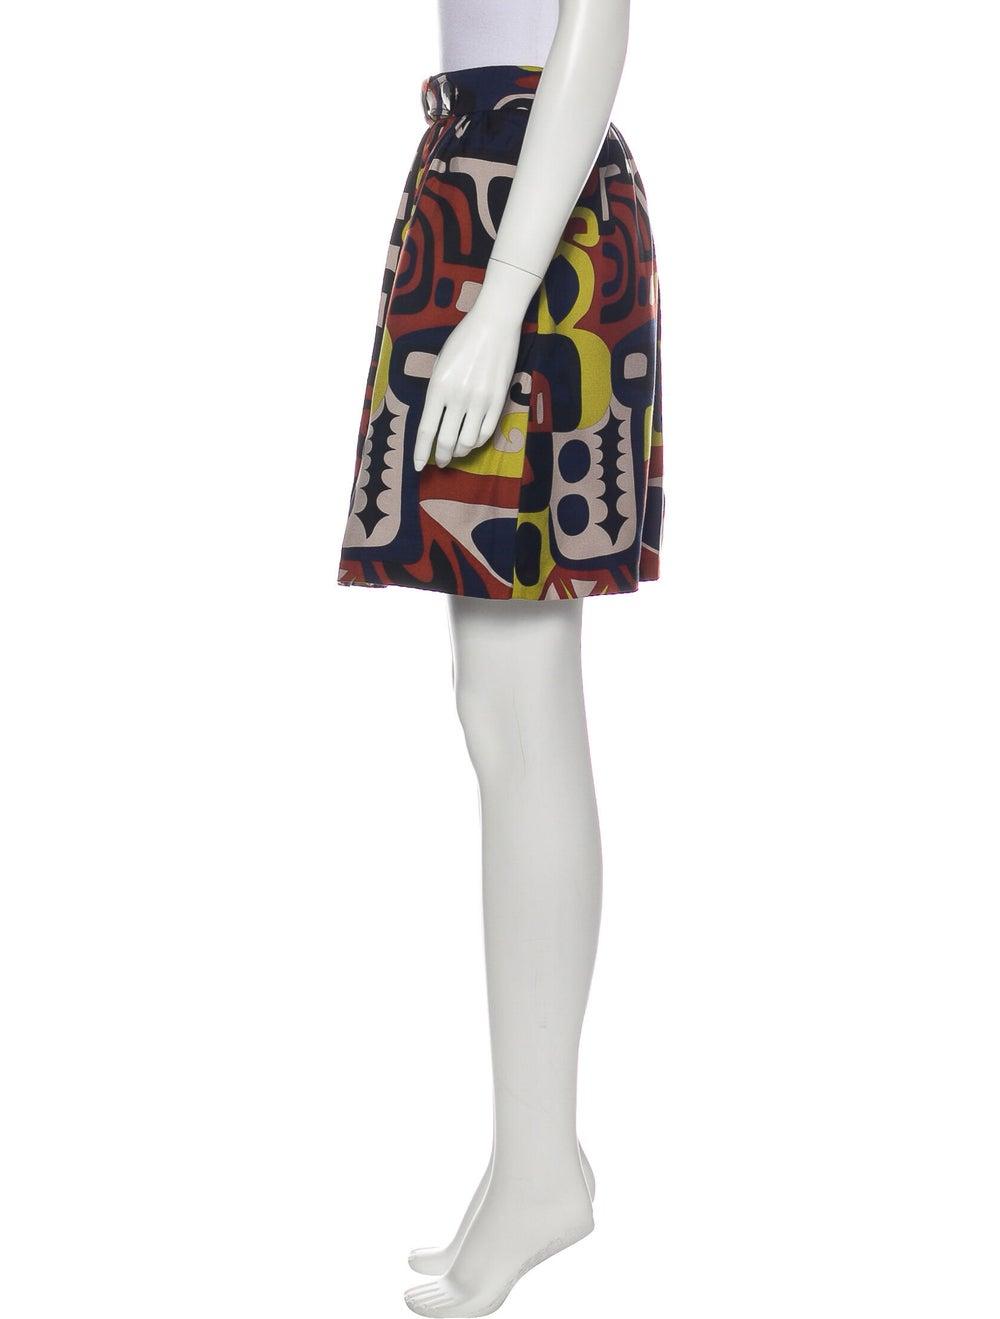 Tibi Silk Mini Skirt - image 2